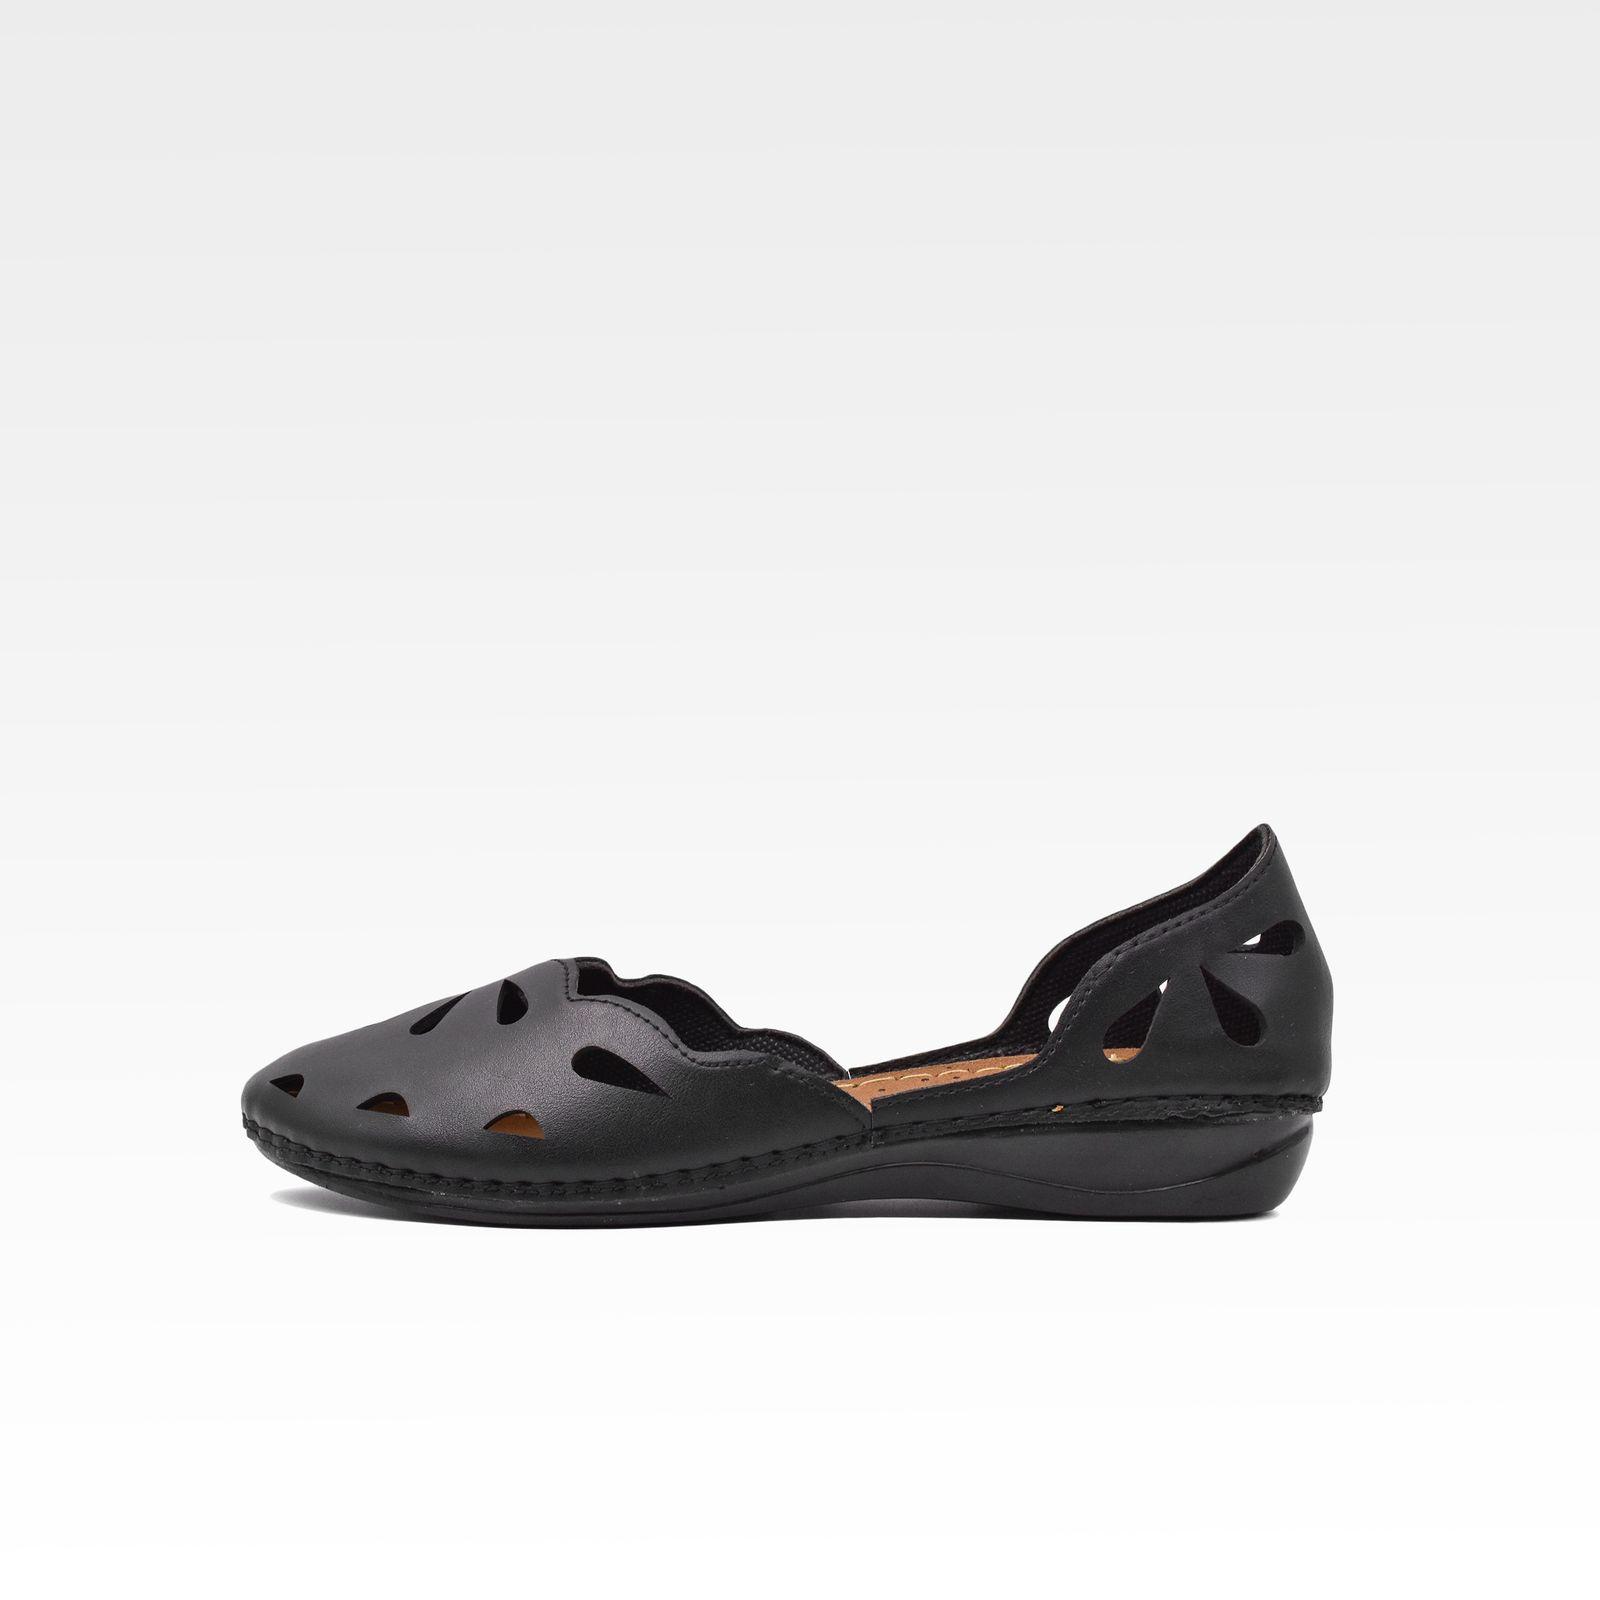 کفش زنانه شهپر مدل رویا 109 کد 7187 -  - 3